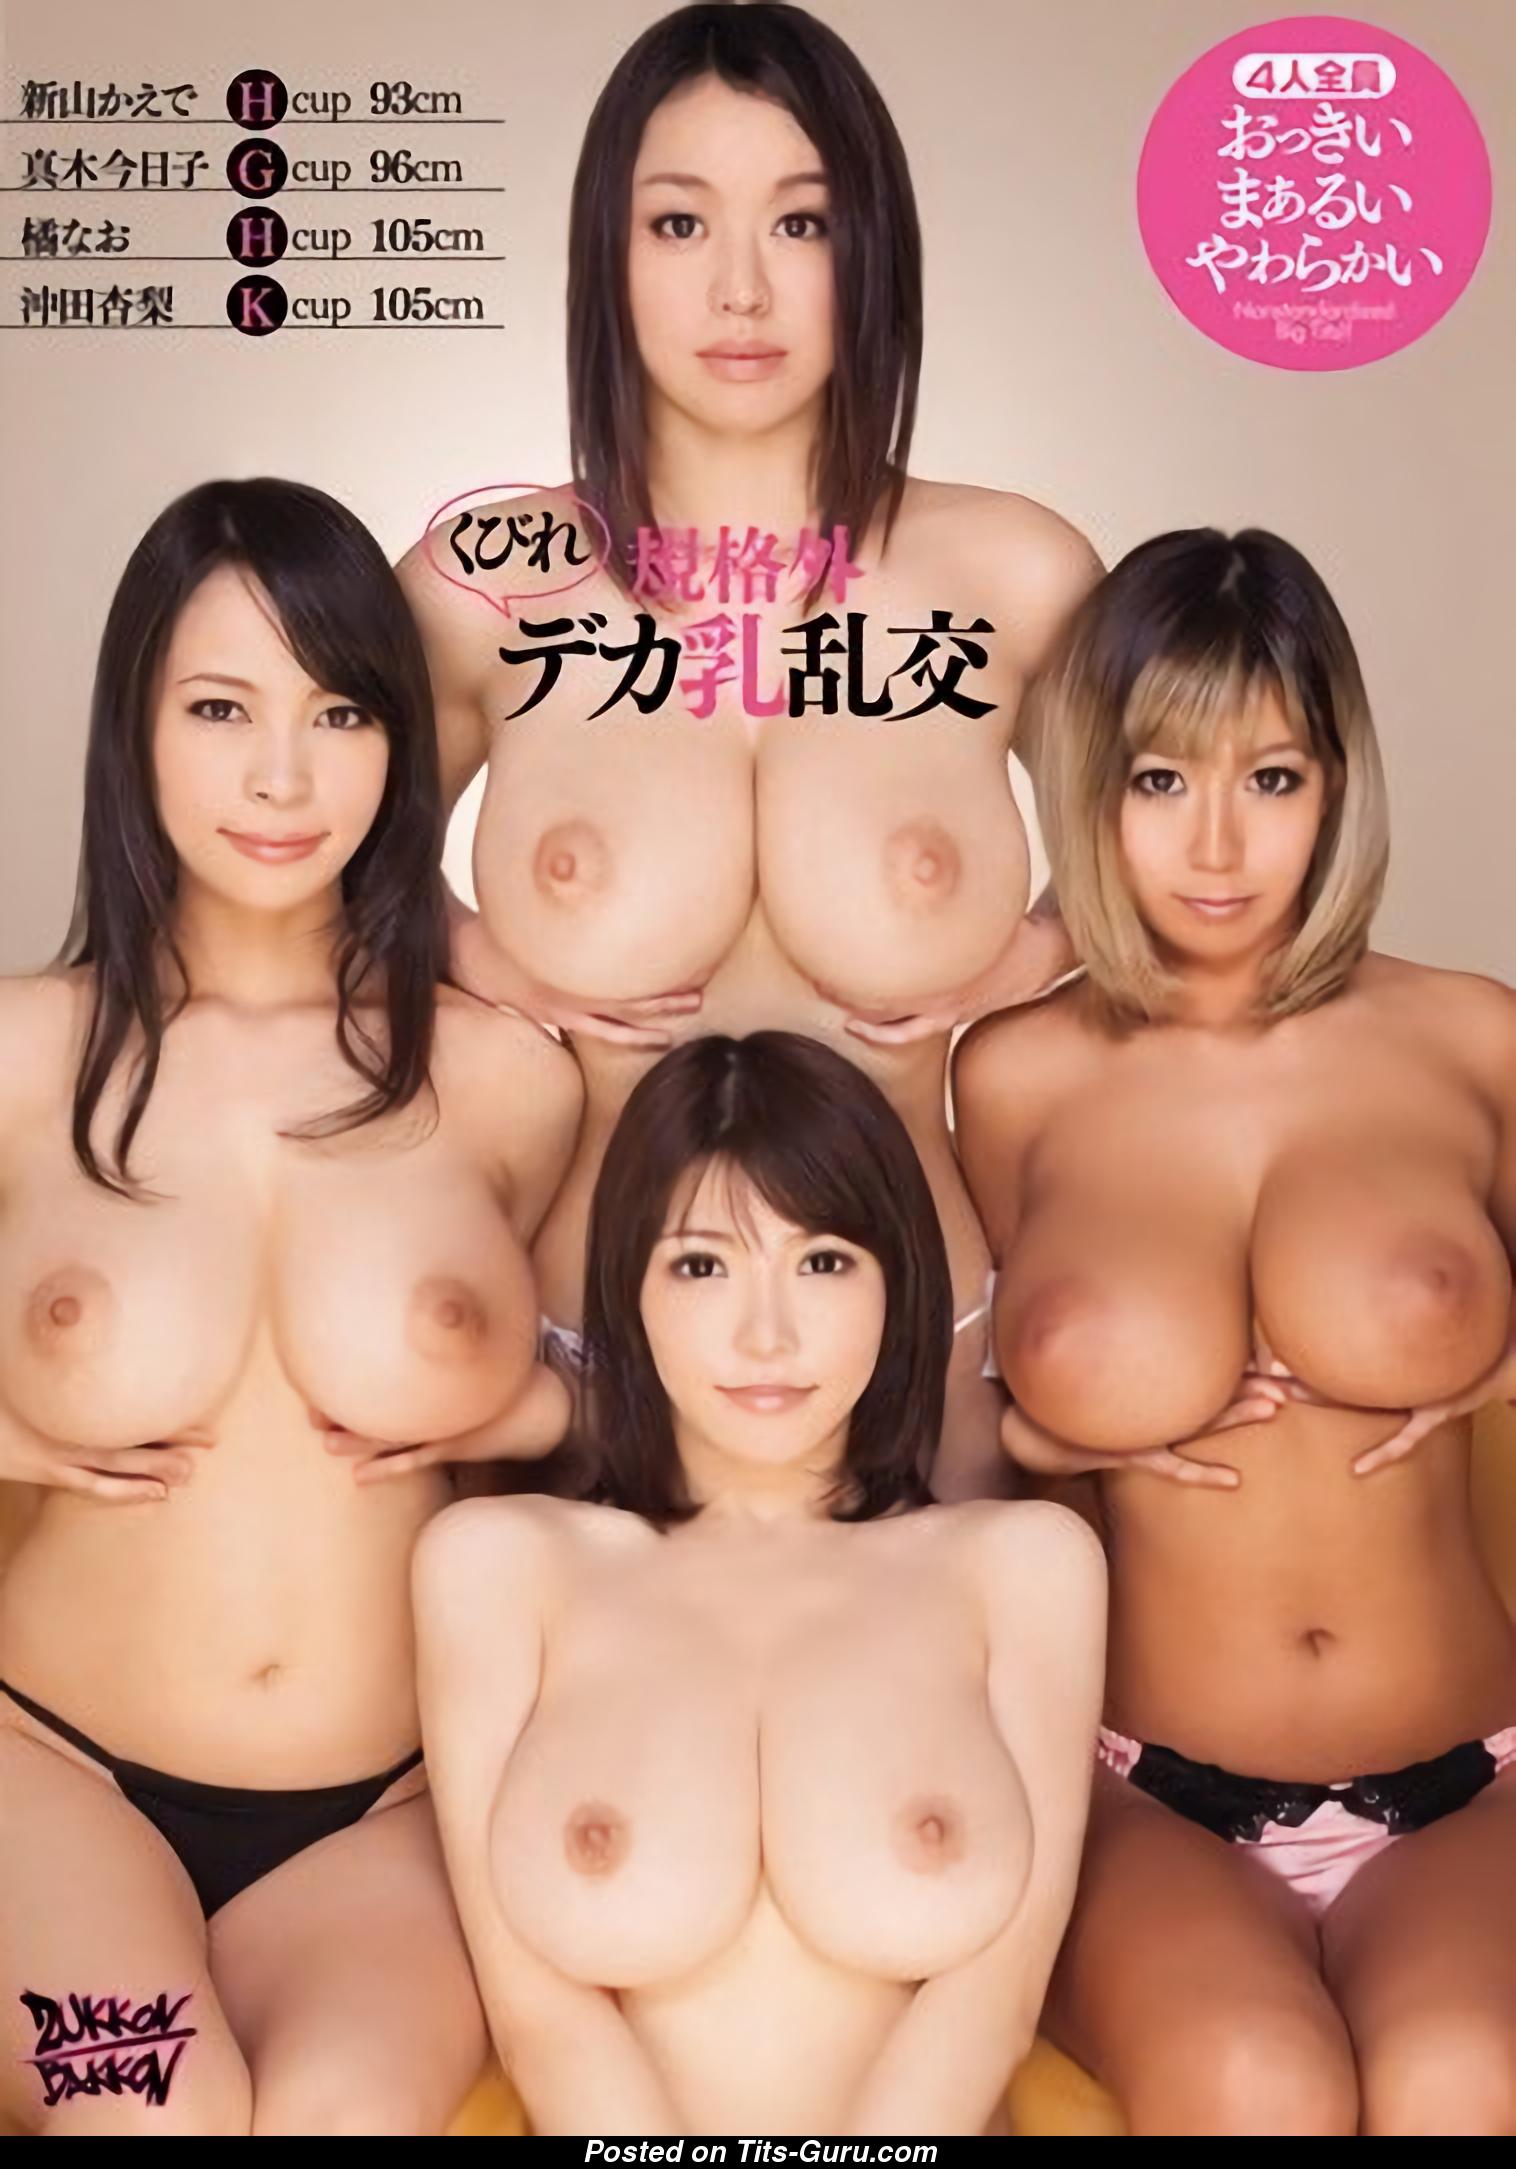 Nude gyaru Cherry Nudes